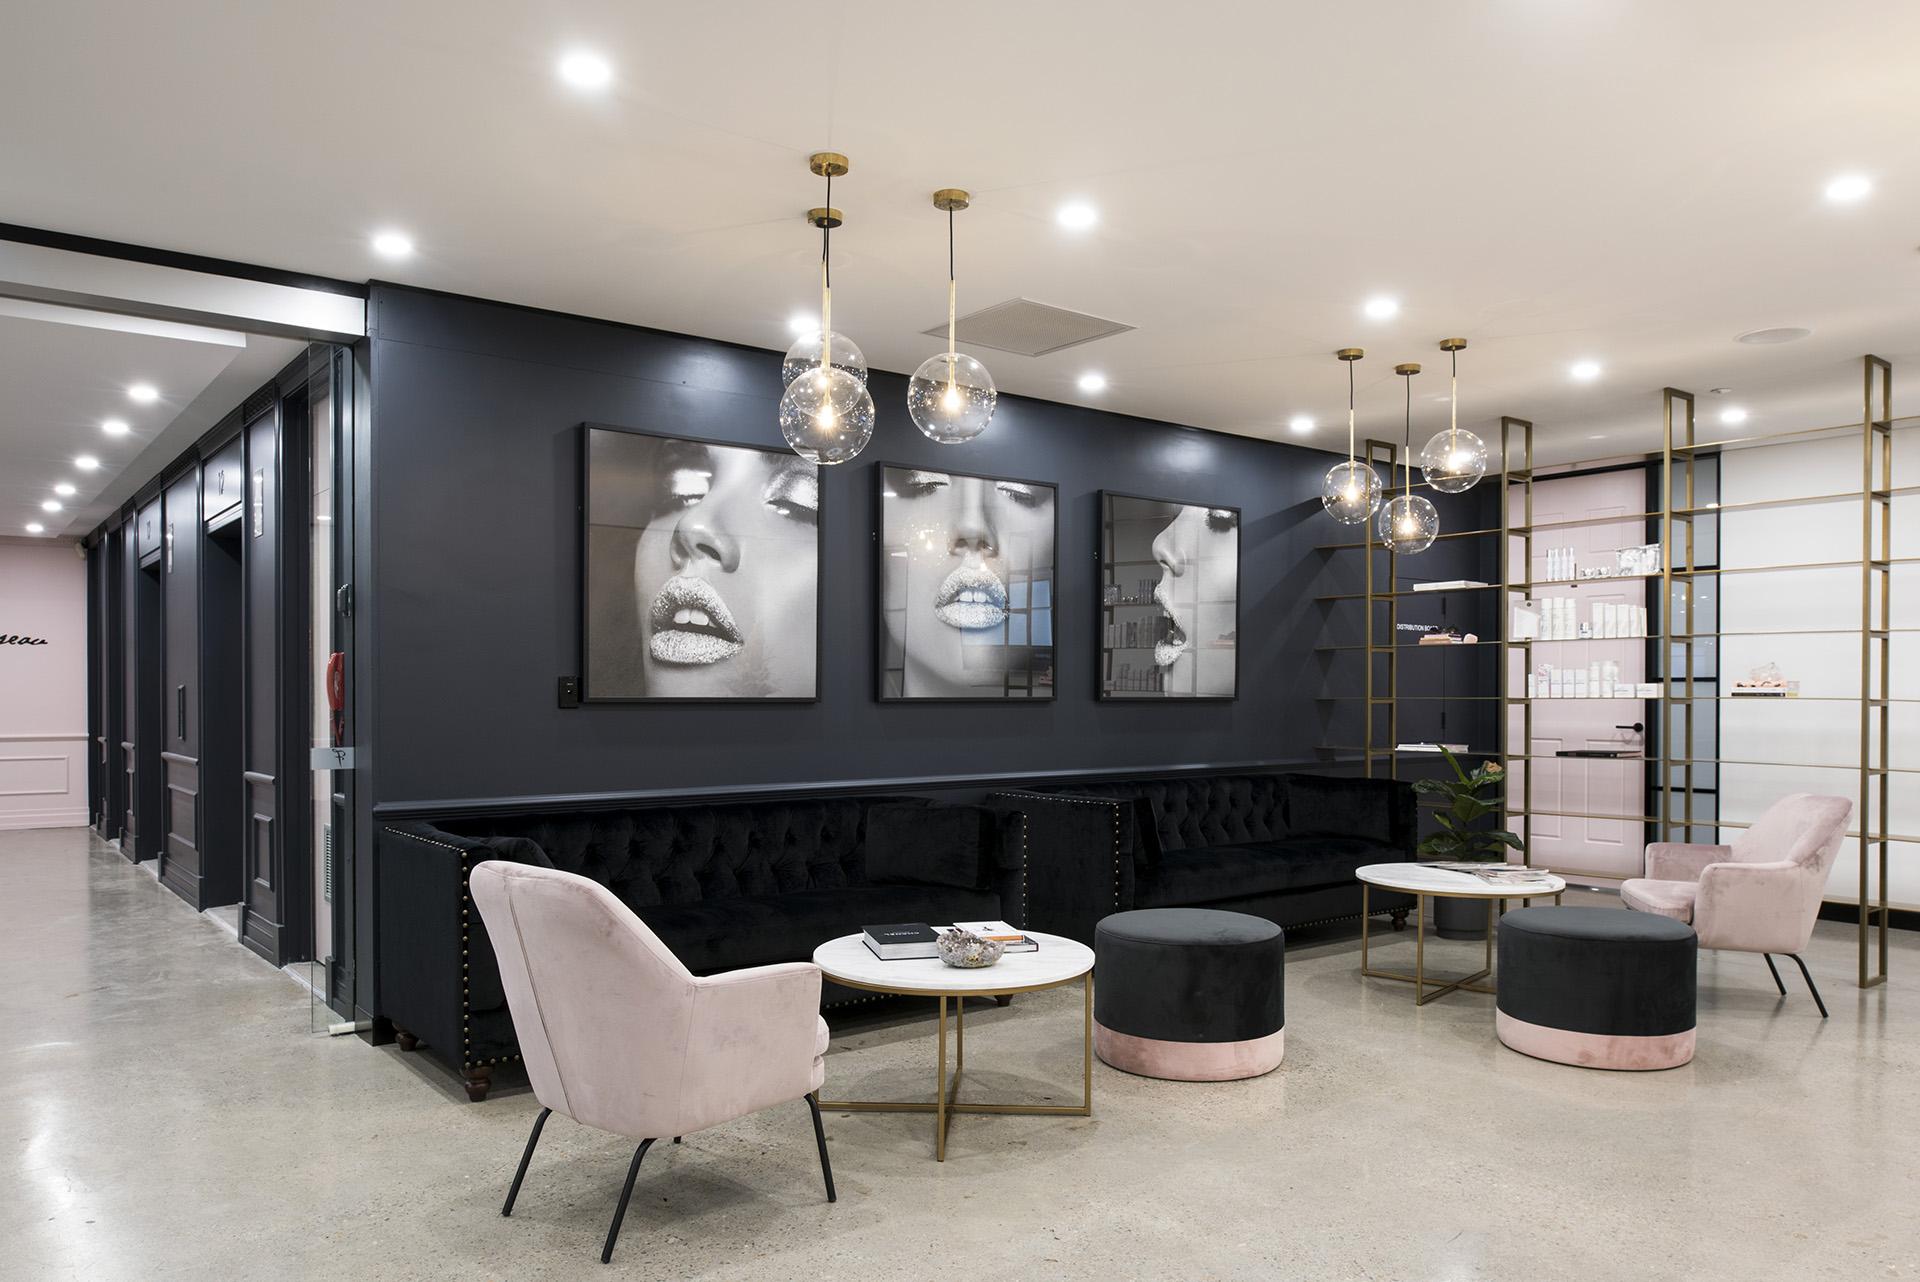 Archway-French Office Design Brisbane- Reception Area 1.jpg